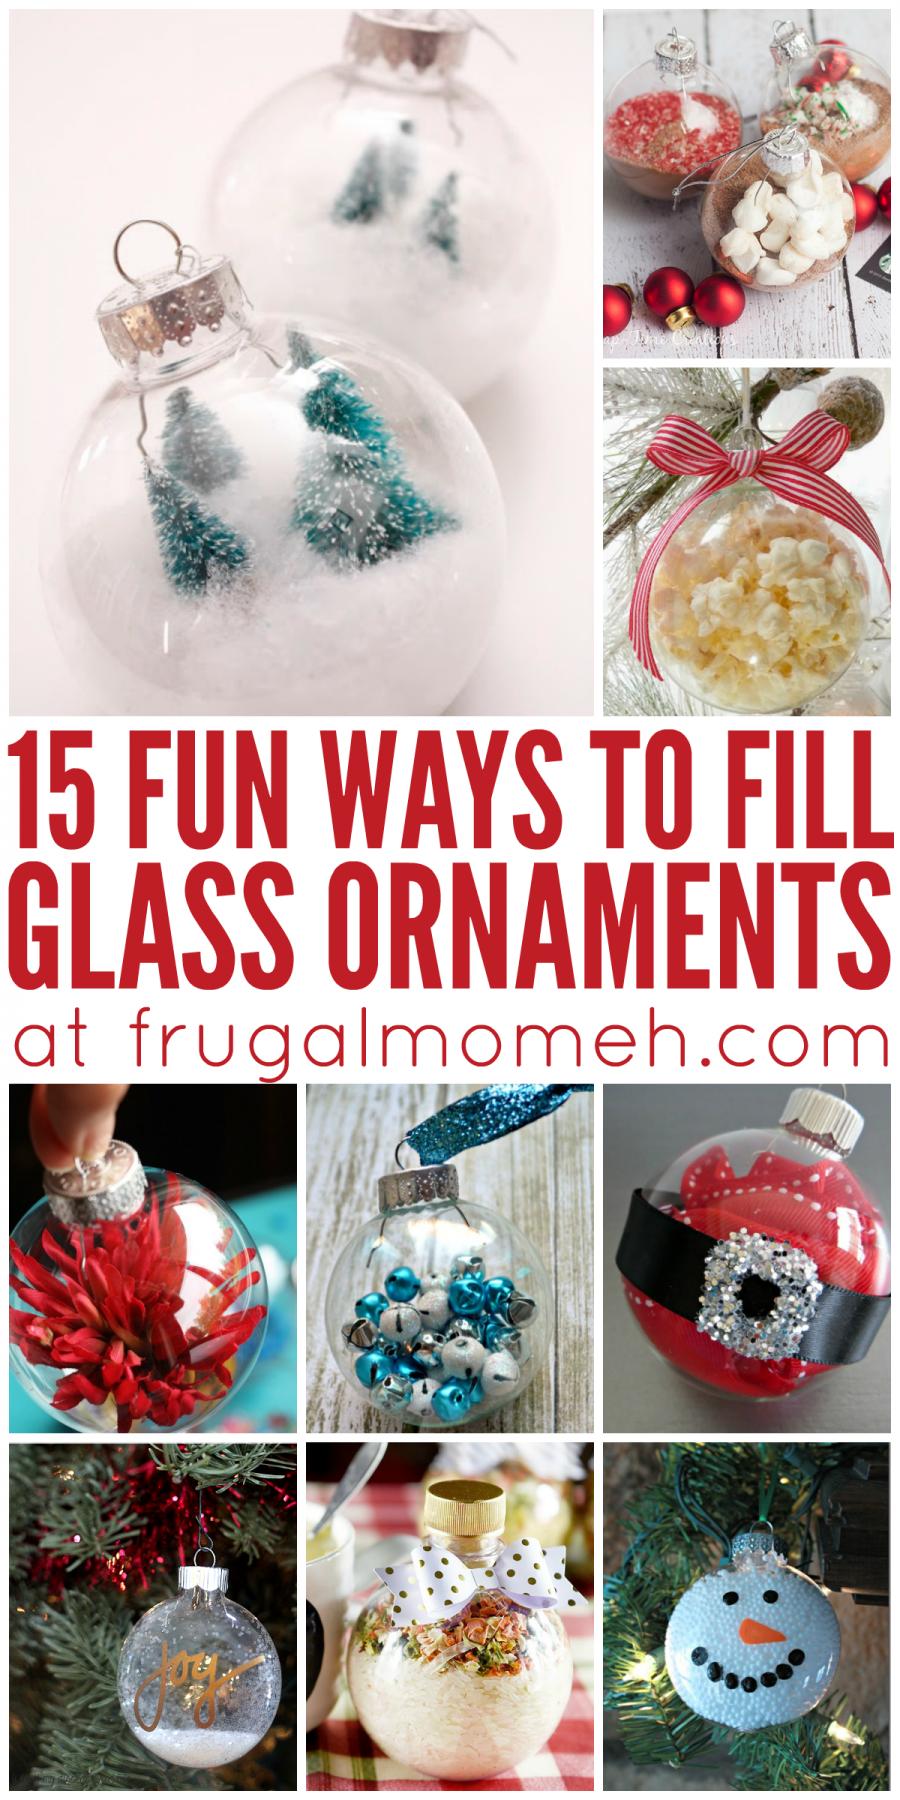 15 Fun Ways To Fill Glass Ornaments Diy Christmas Gifts Ornaments Christmas Ornaments Handmade Christmas Ornaments